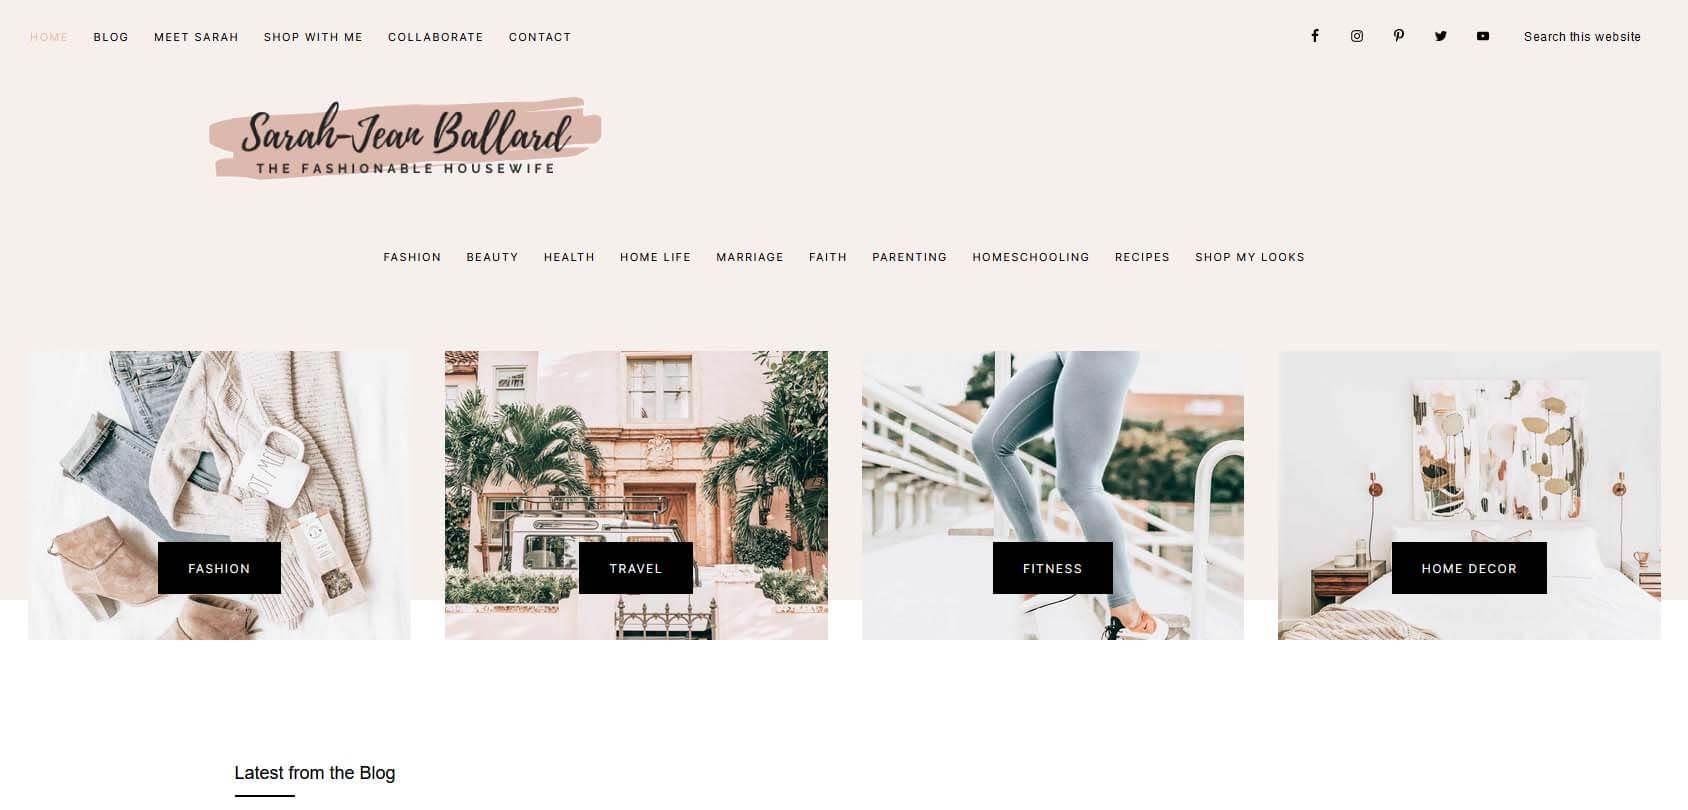 The Fashionable Housewife Homepage